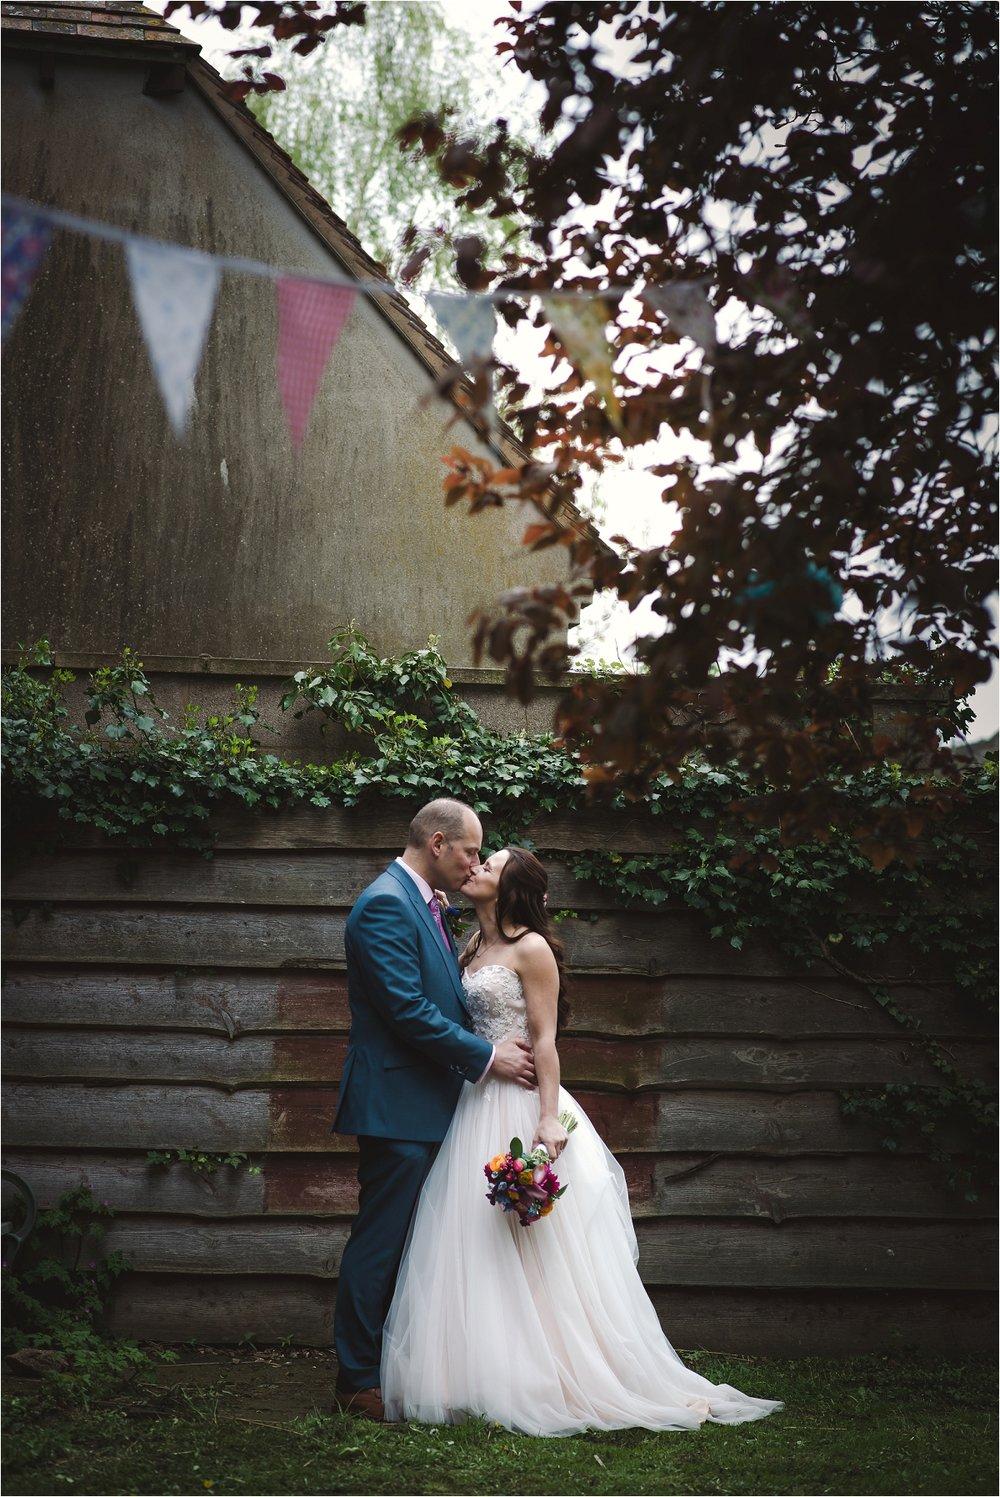 chris_emma_wedding_the_Fleece_inn_0073.jpg